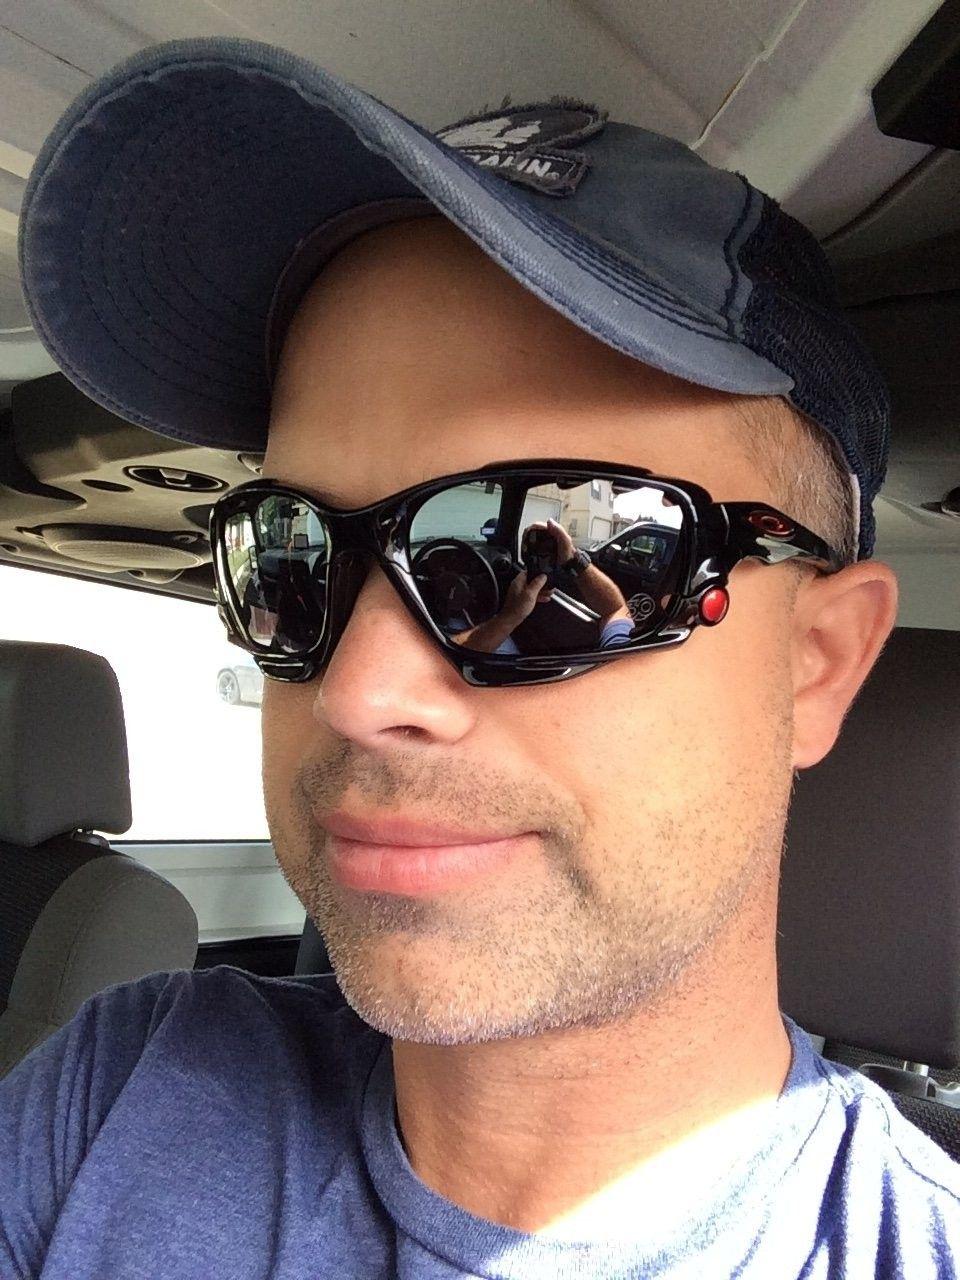 What makes Oakley eyewear so good? - image.jpeg